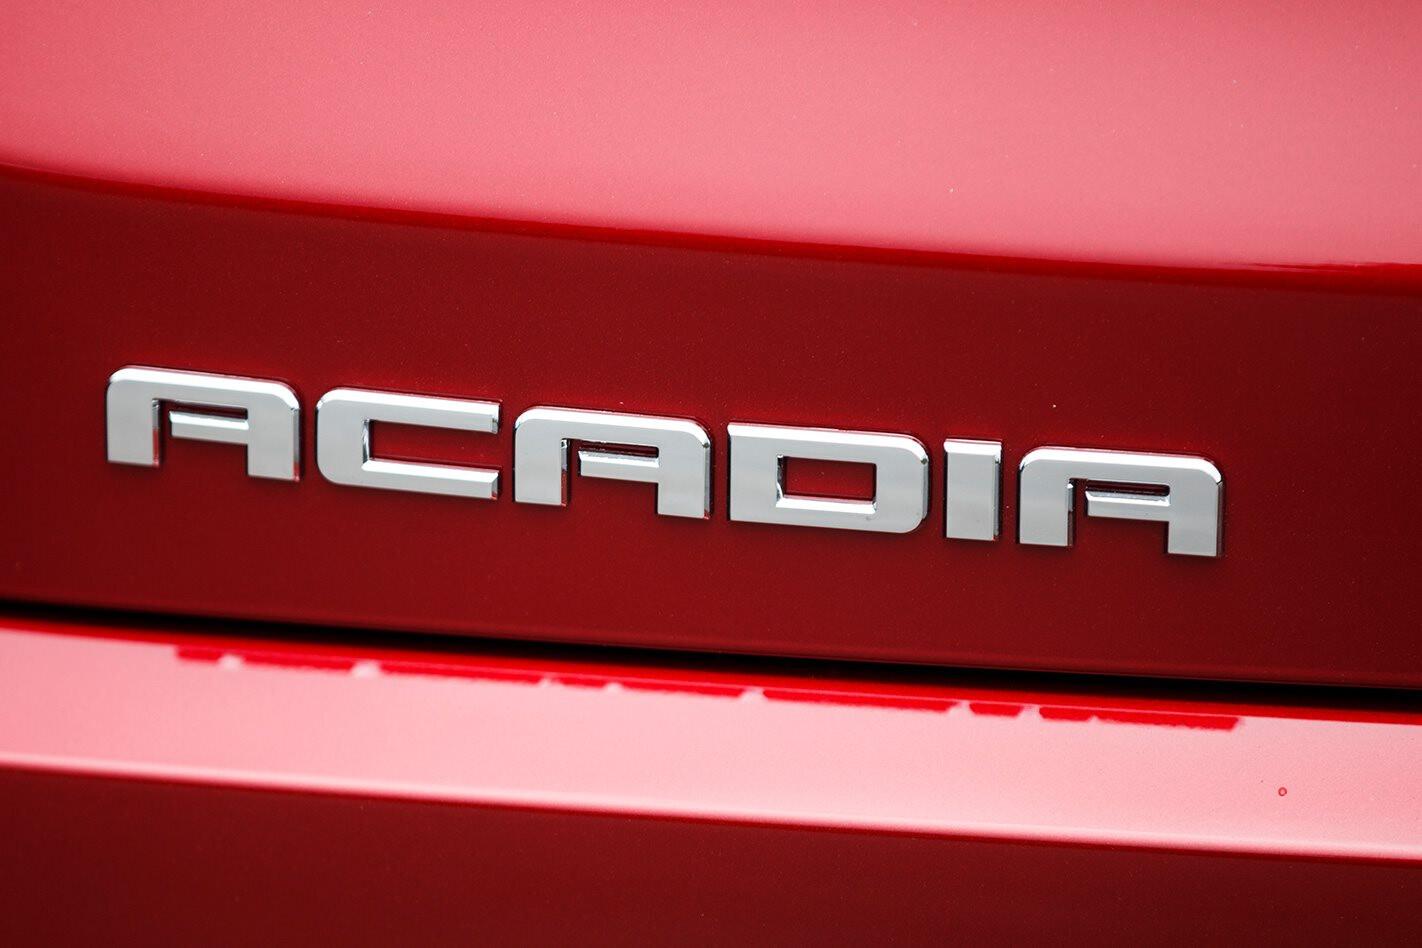 Holden Acadia Badge Jpg